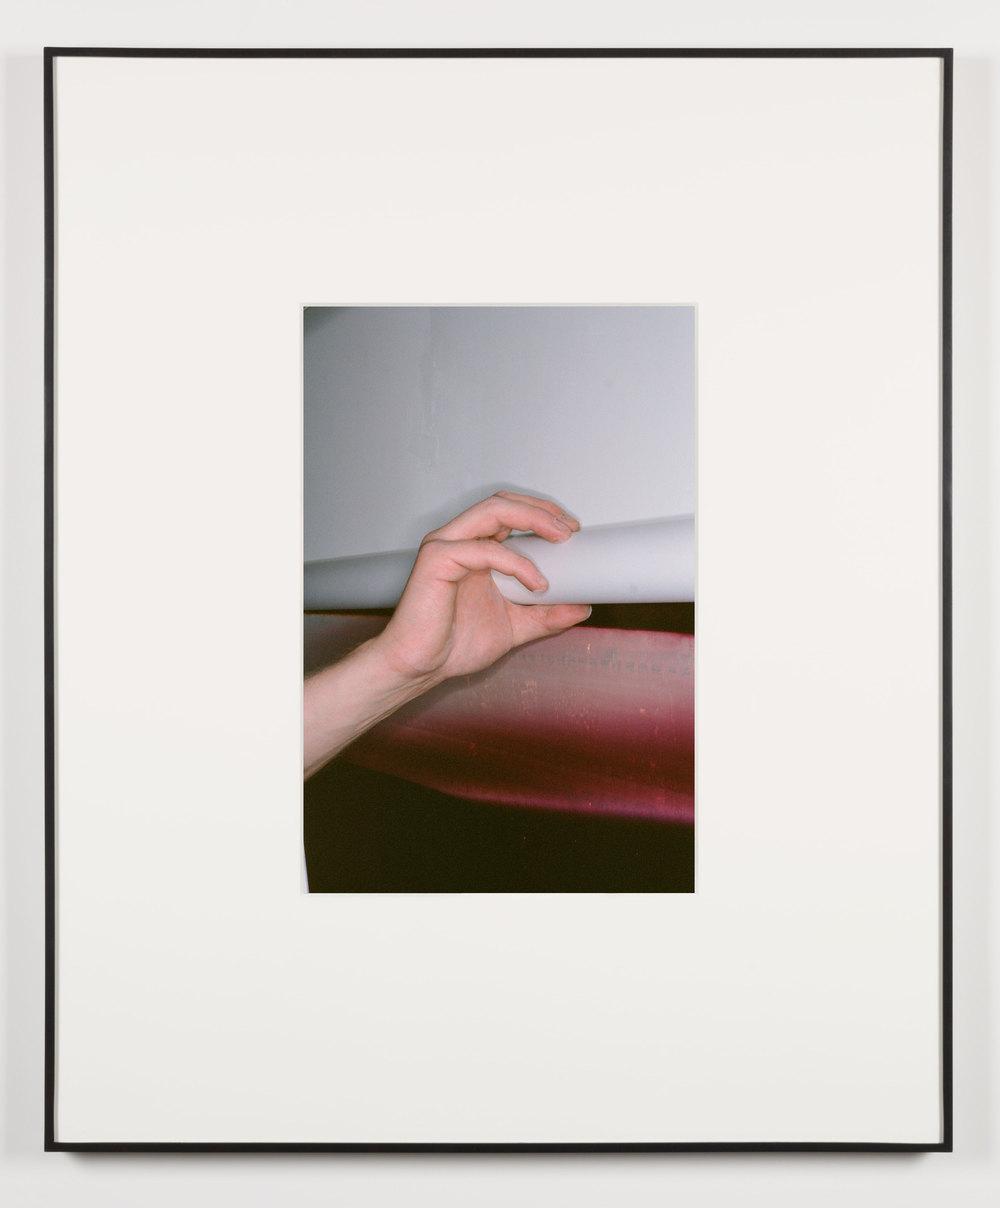 Die Technik der Eroberung (Los Angeles, California, January 14, 2014)   2014  Chromogenic print  20 x 13 1/2 inches   Selected Bodies of Work, 2014